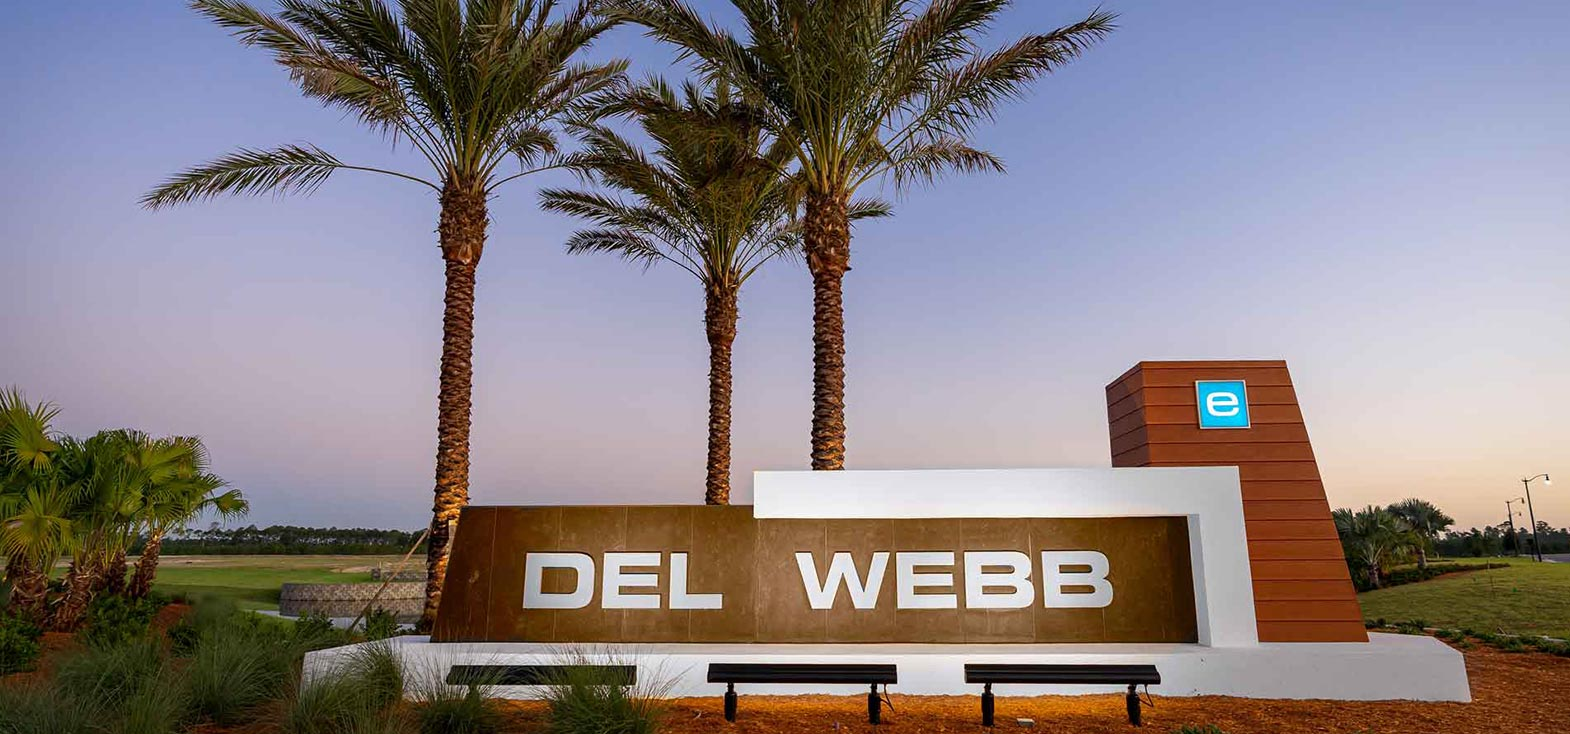 Del Webb eTown sign